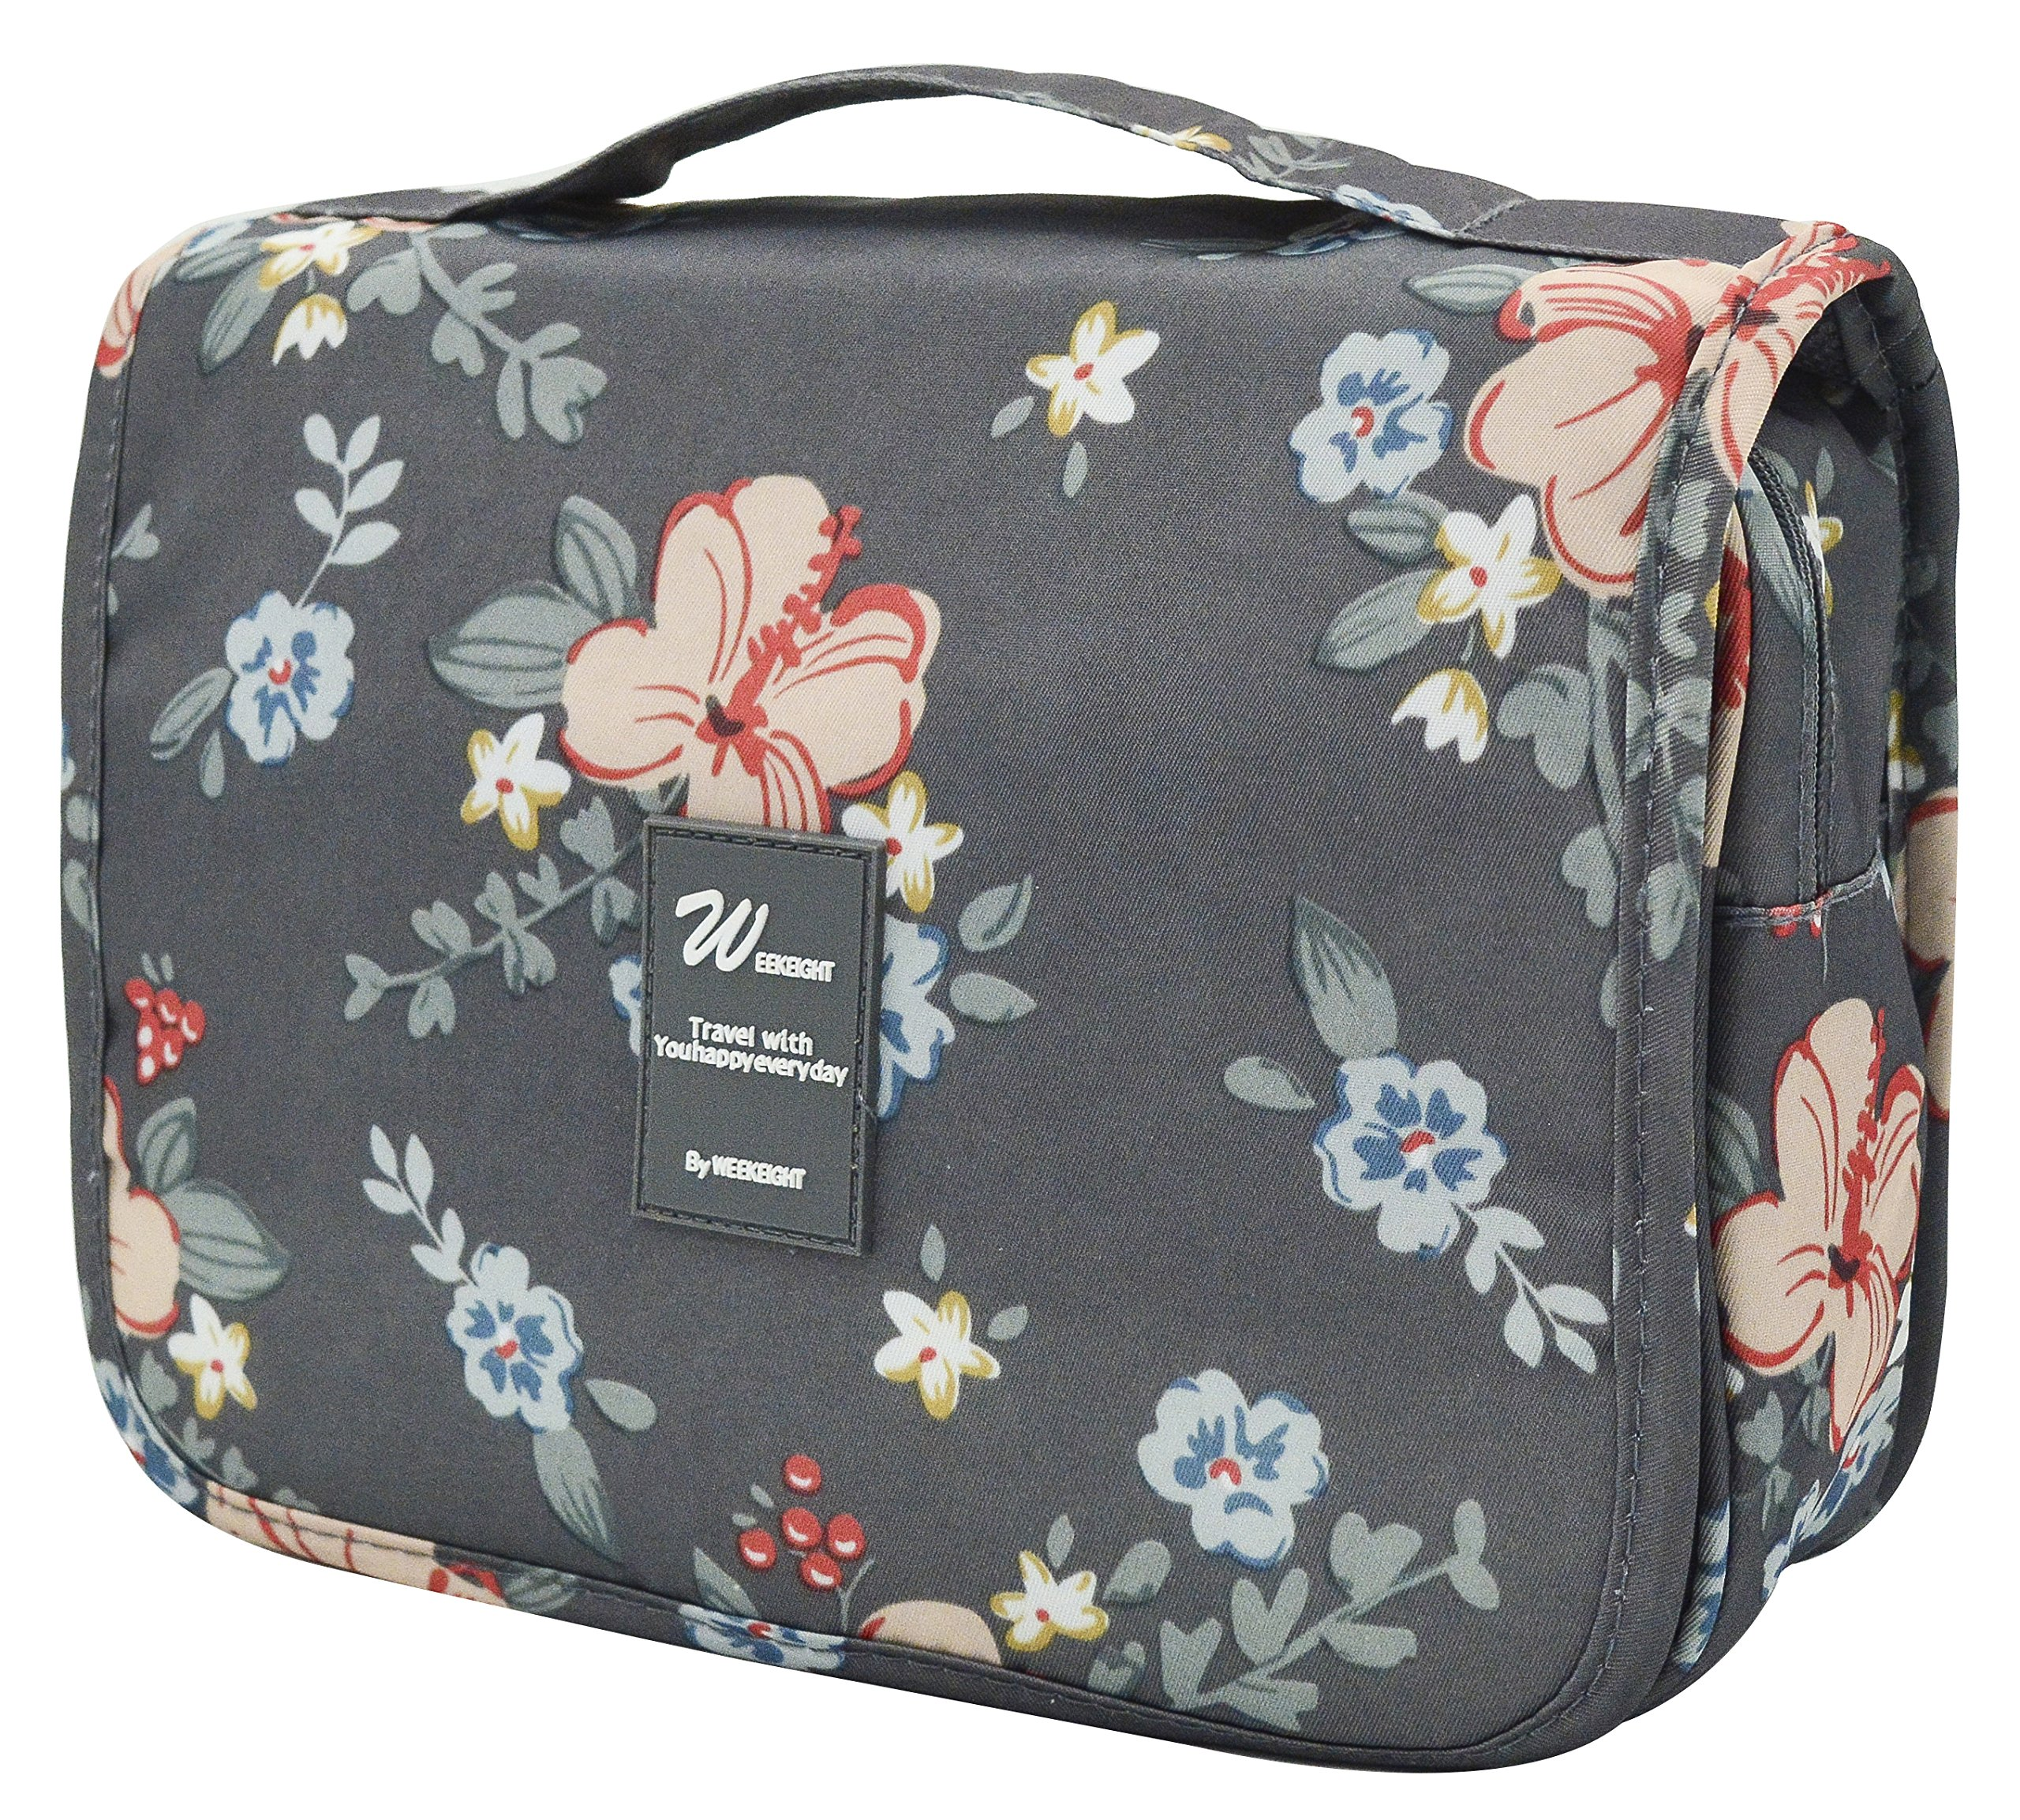 Adigow Hanging Toiletry Bag - Portable Waterproof Cosmetic Makeup Wash Bag for Men & Women - Travel Kit Organizer with Sturdy Hook (Dark Grey Flowers)